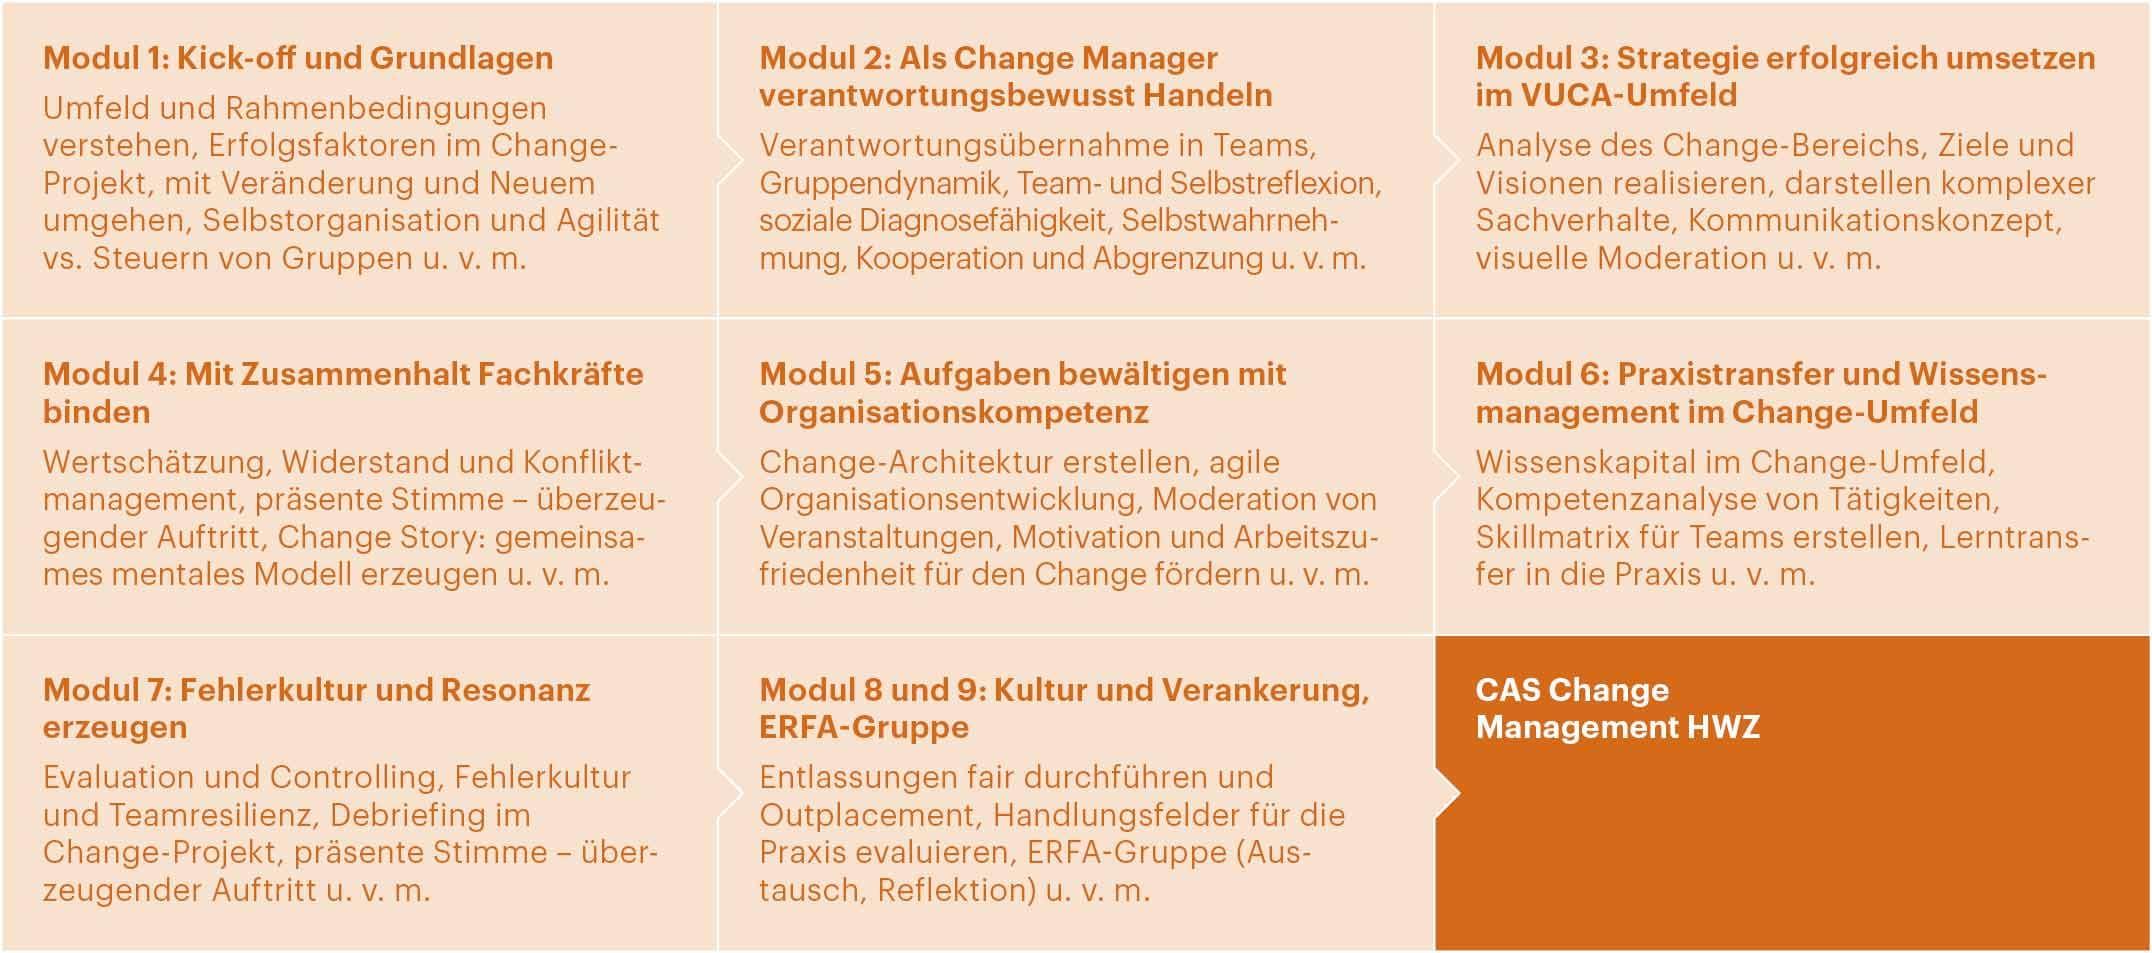 Aufbau CAS Change Management HWZ